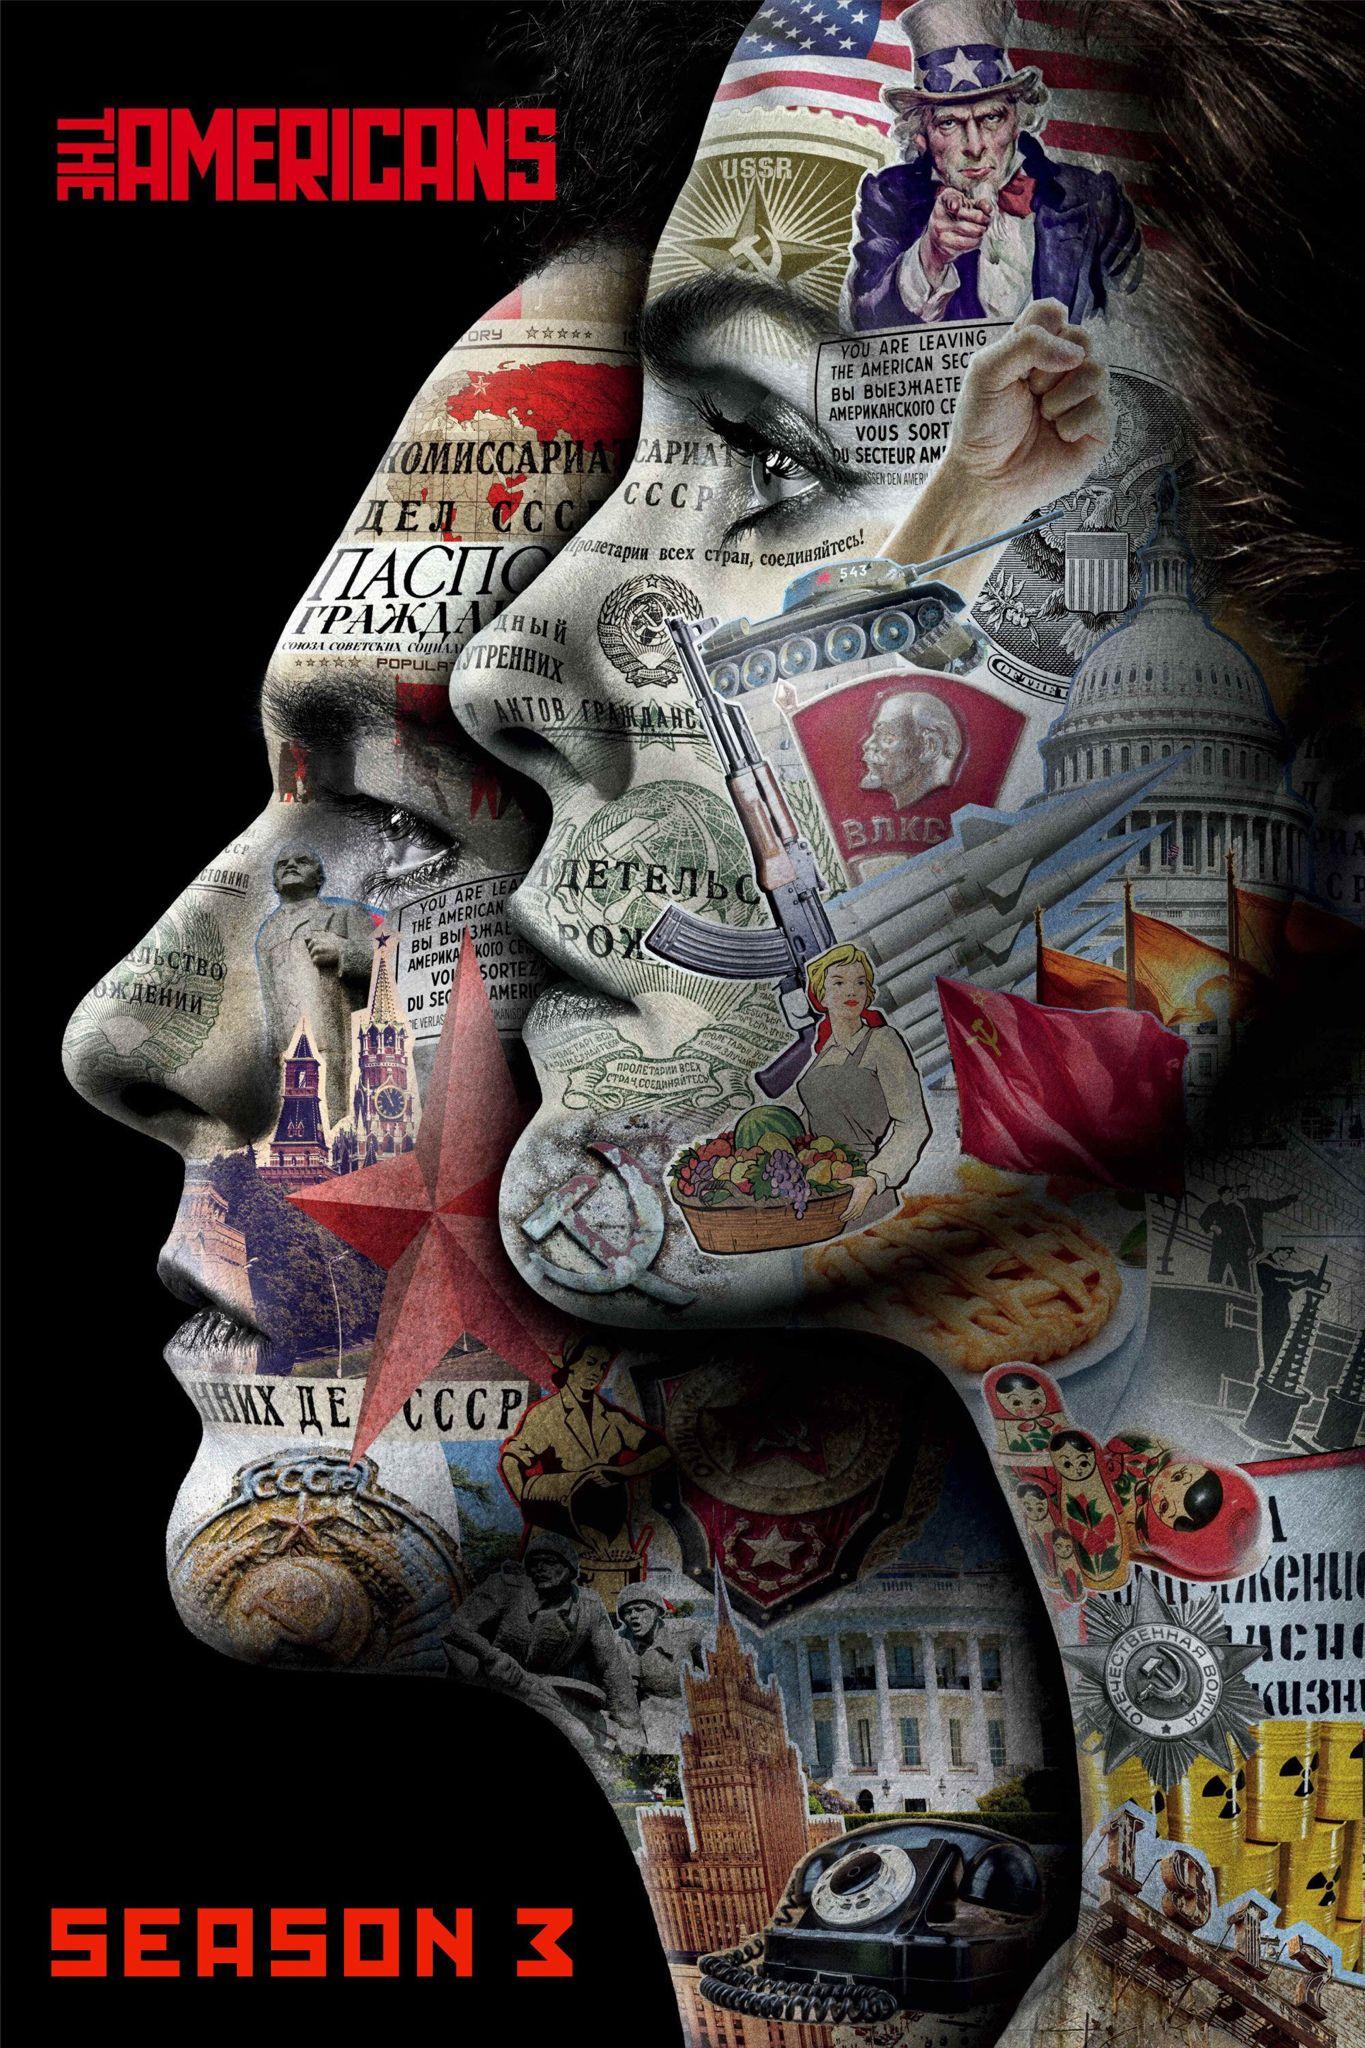 The Americans (2015) Season 3, 13 Episodes | Crime, Drama, Mystery | FX, Netflix | ジ・アメリカンズ シーズン3 全13話